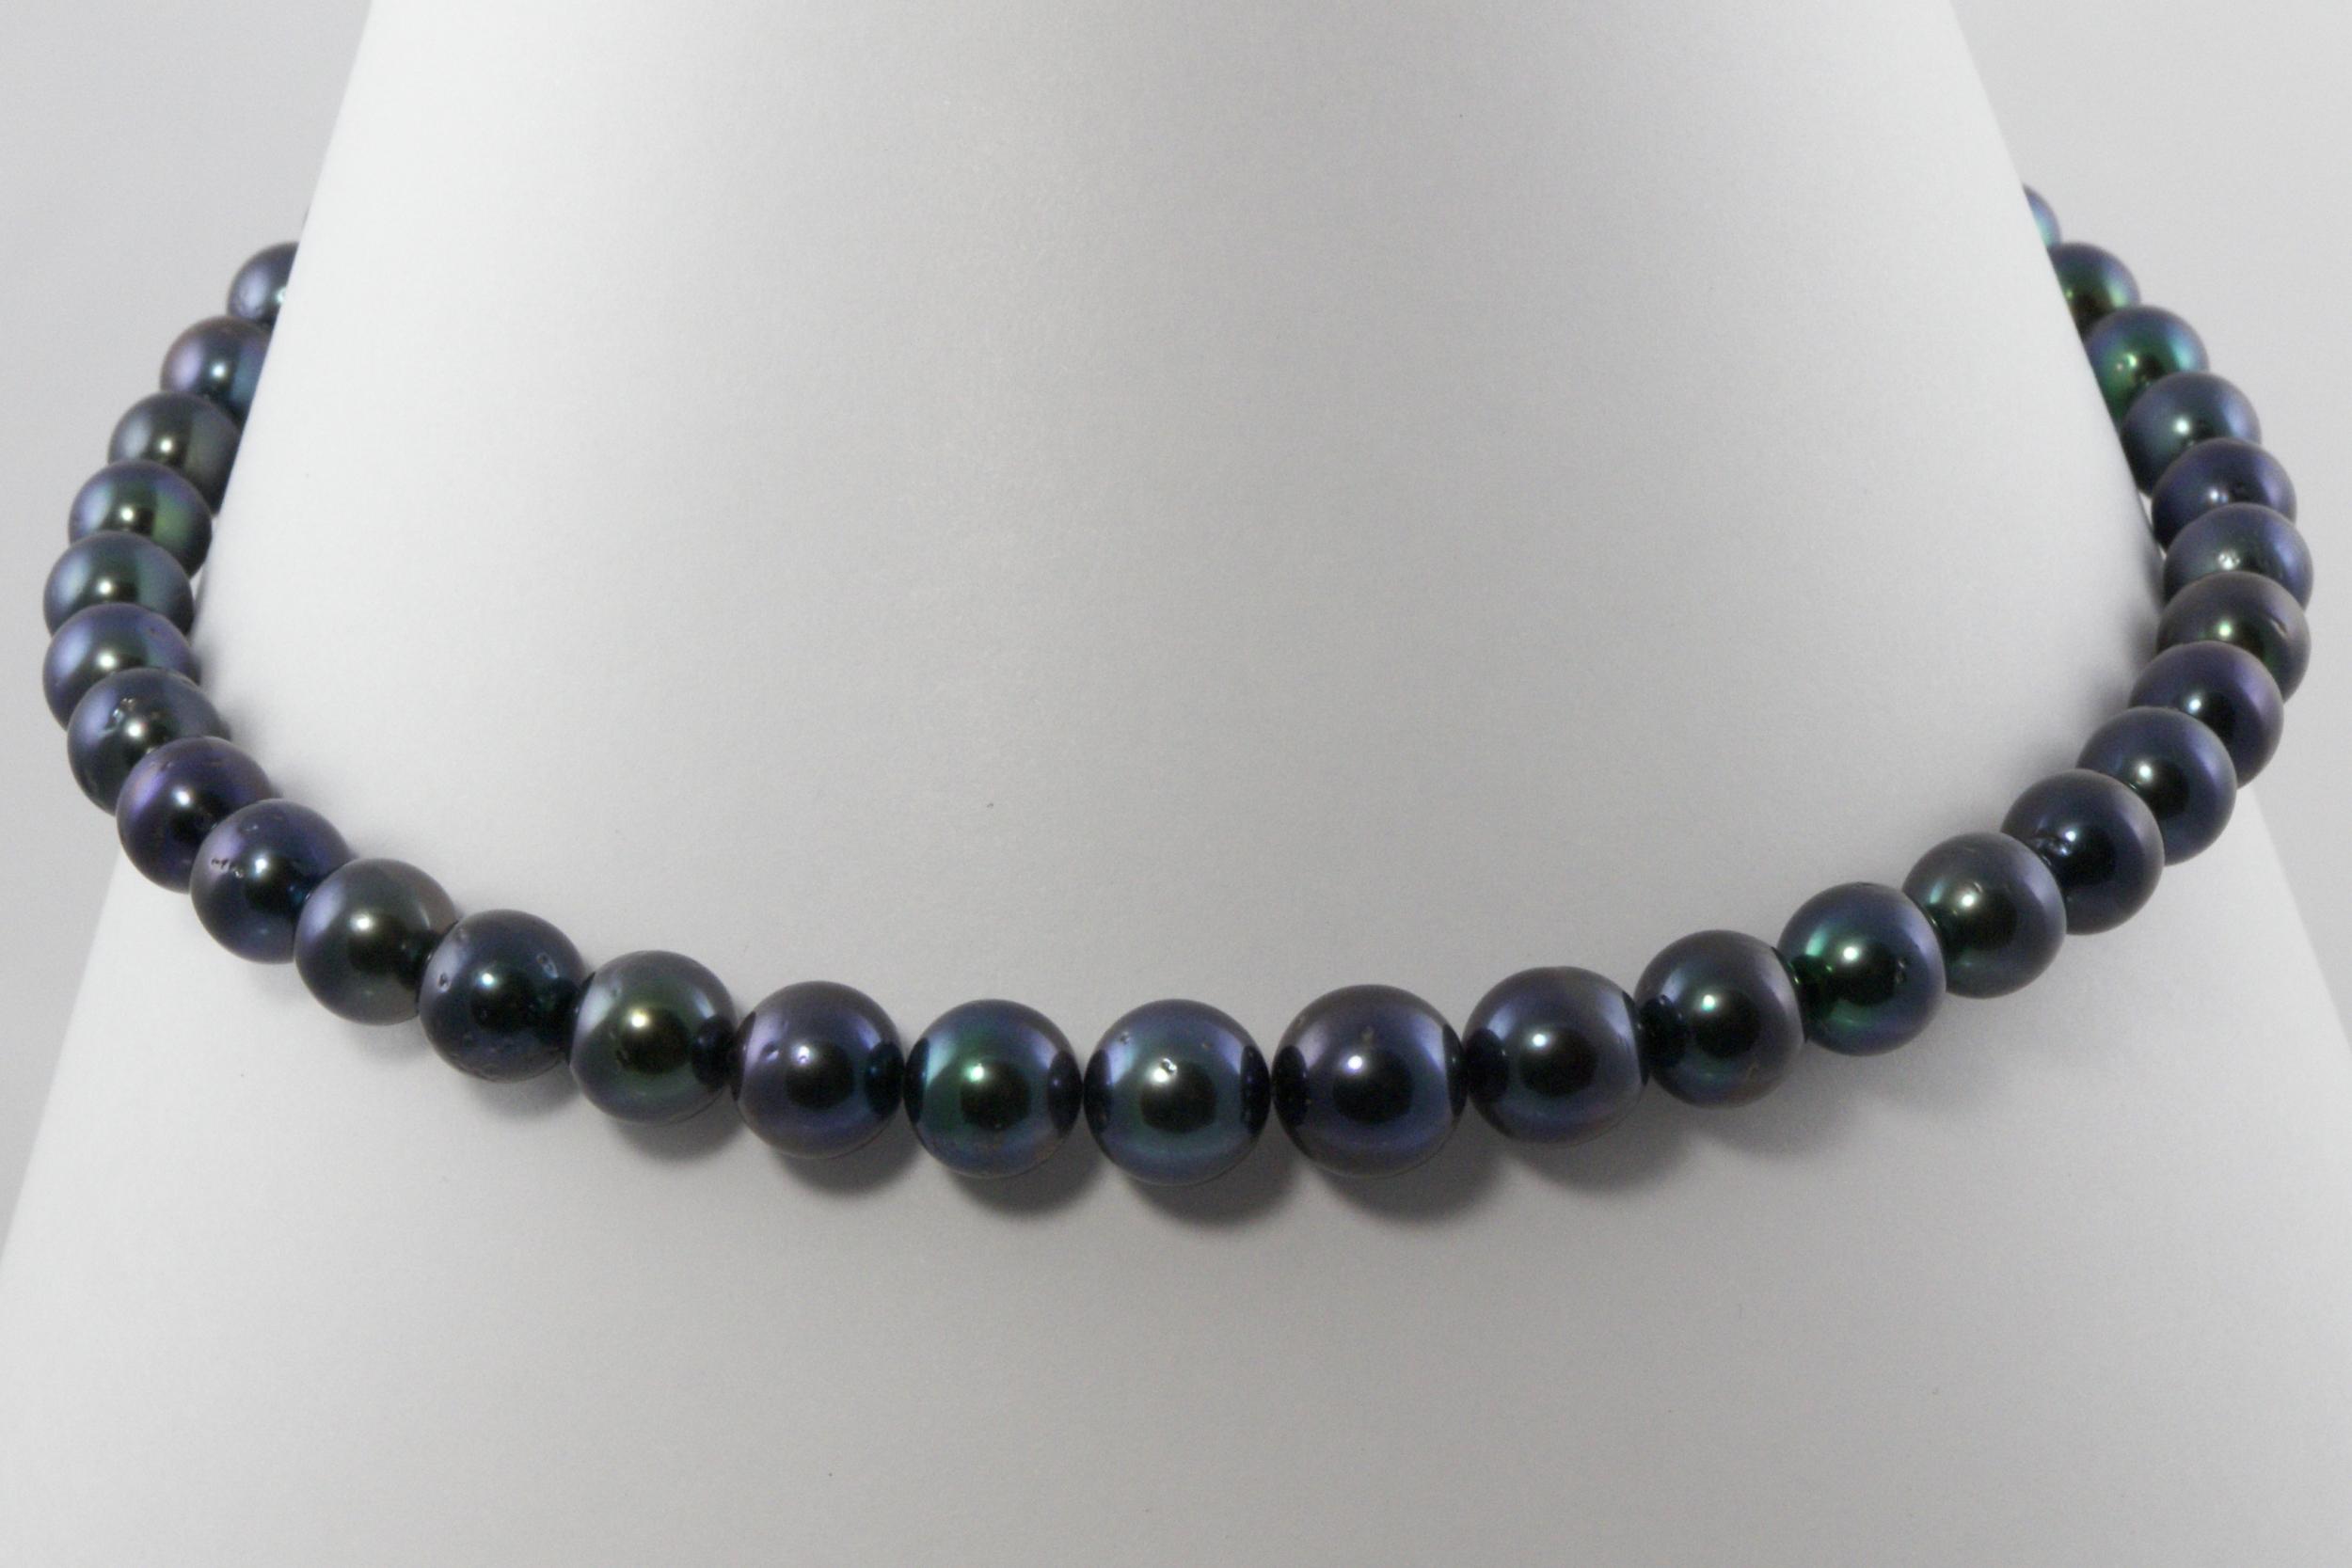 Collier Princesse 45 perles de Tahiti bleu/vert violet